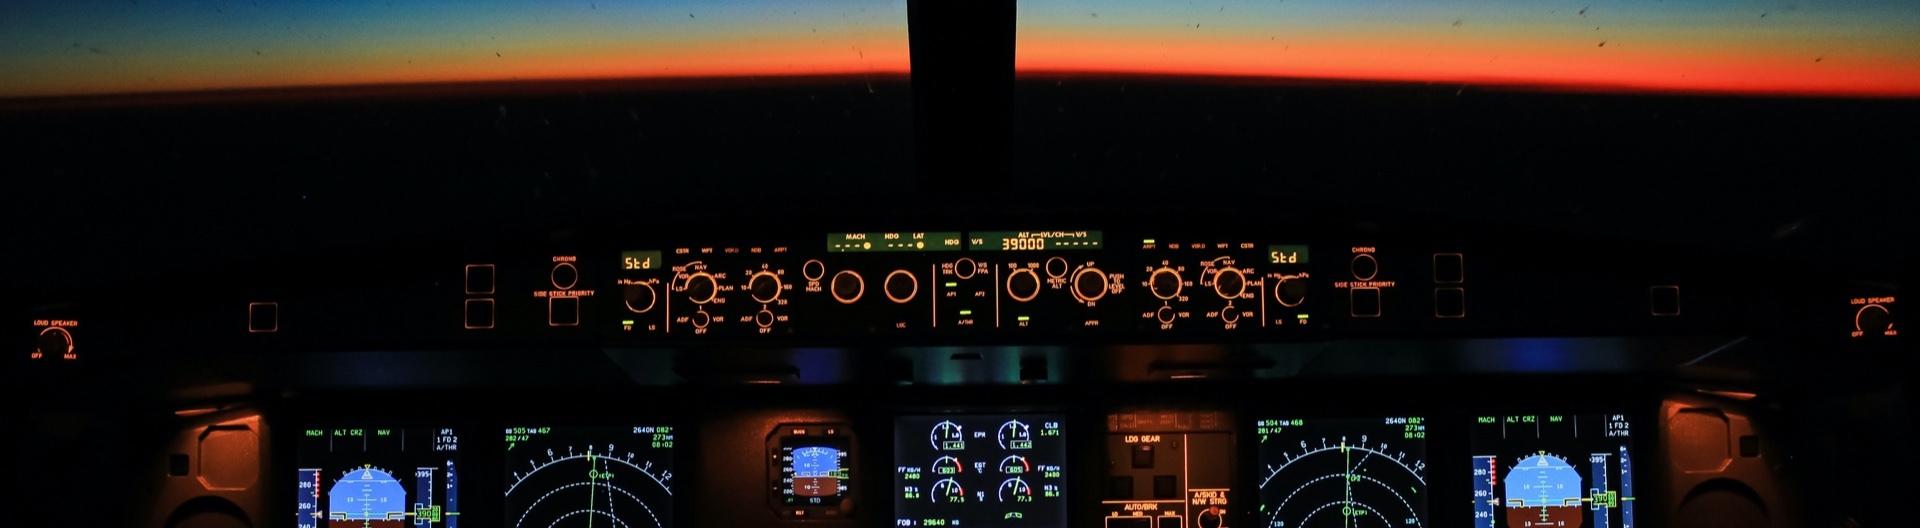 Cockpit bei Sonnenaufgang